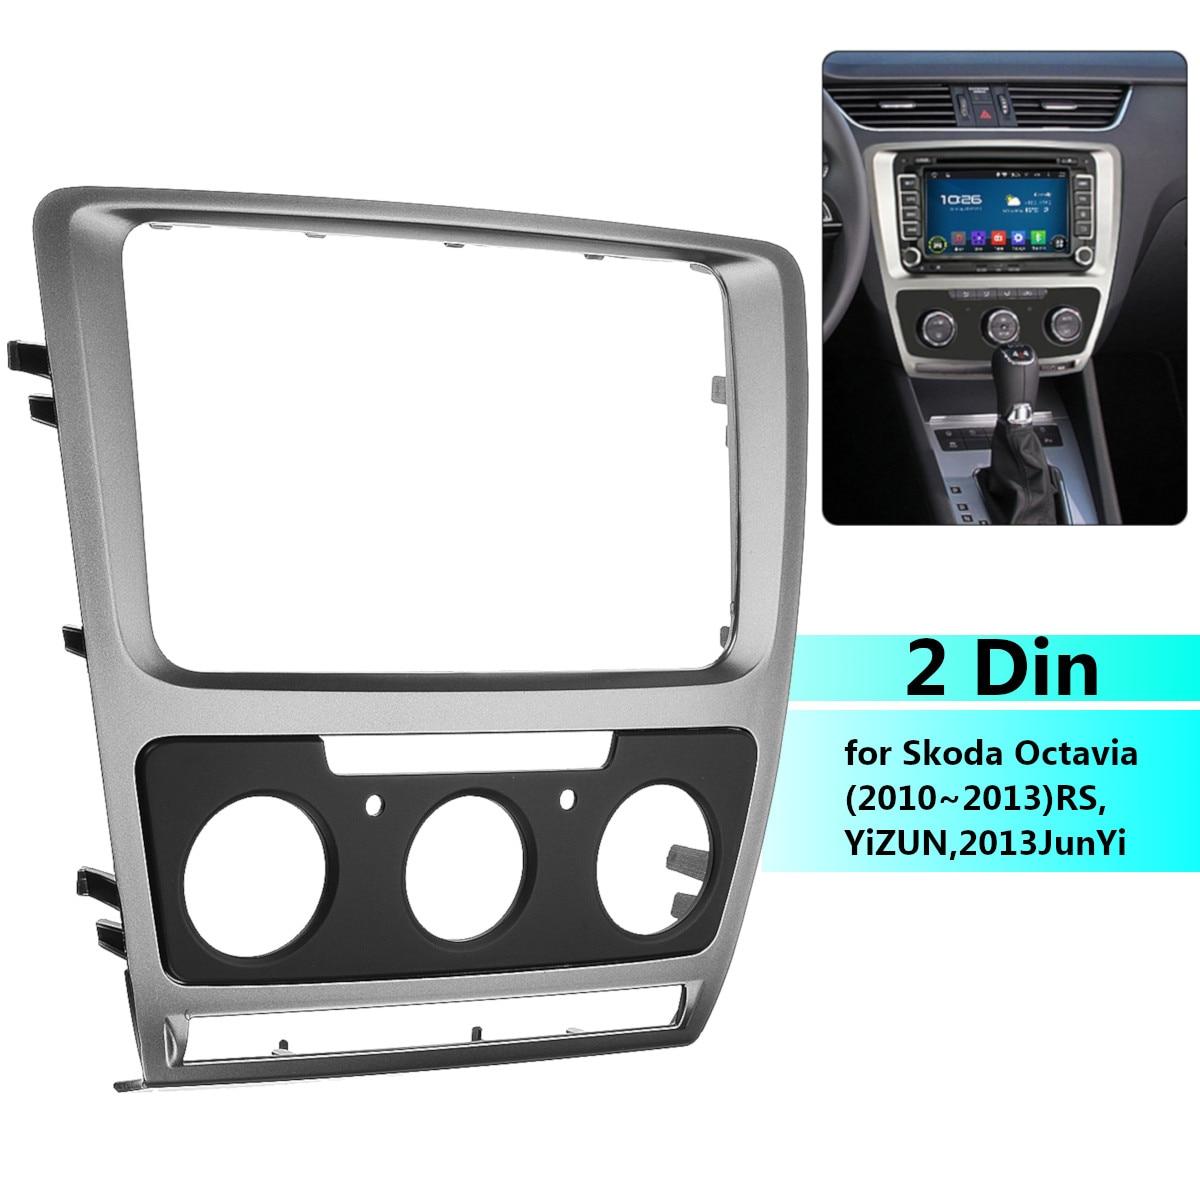 Car Stereo Radio Fascia Panel Plate Frame CD DVD Audio Dash Mount Trim For Skoda Octavia Manual A/C 2010 2011 2012 2013